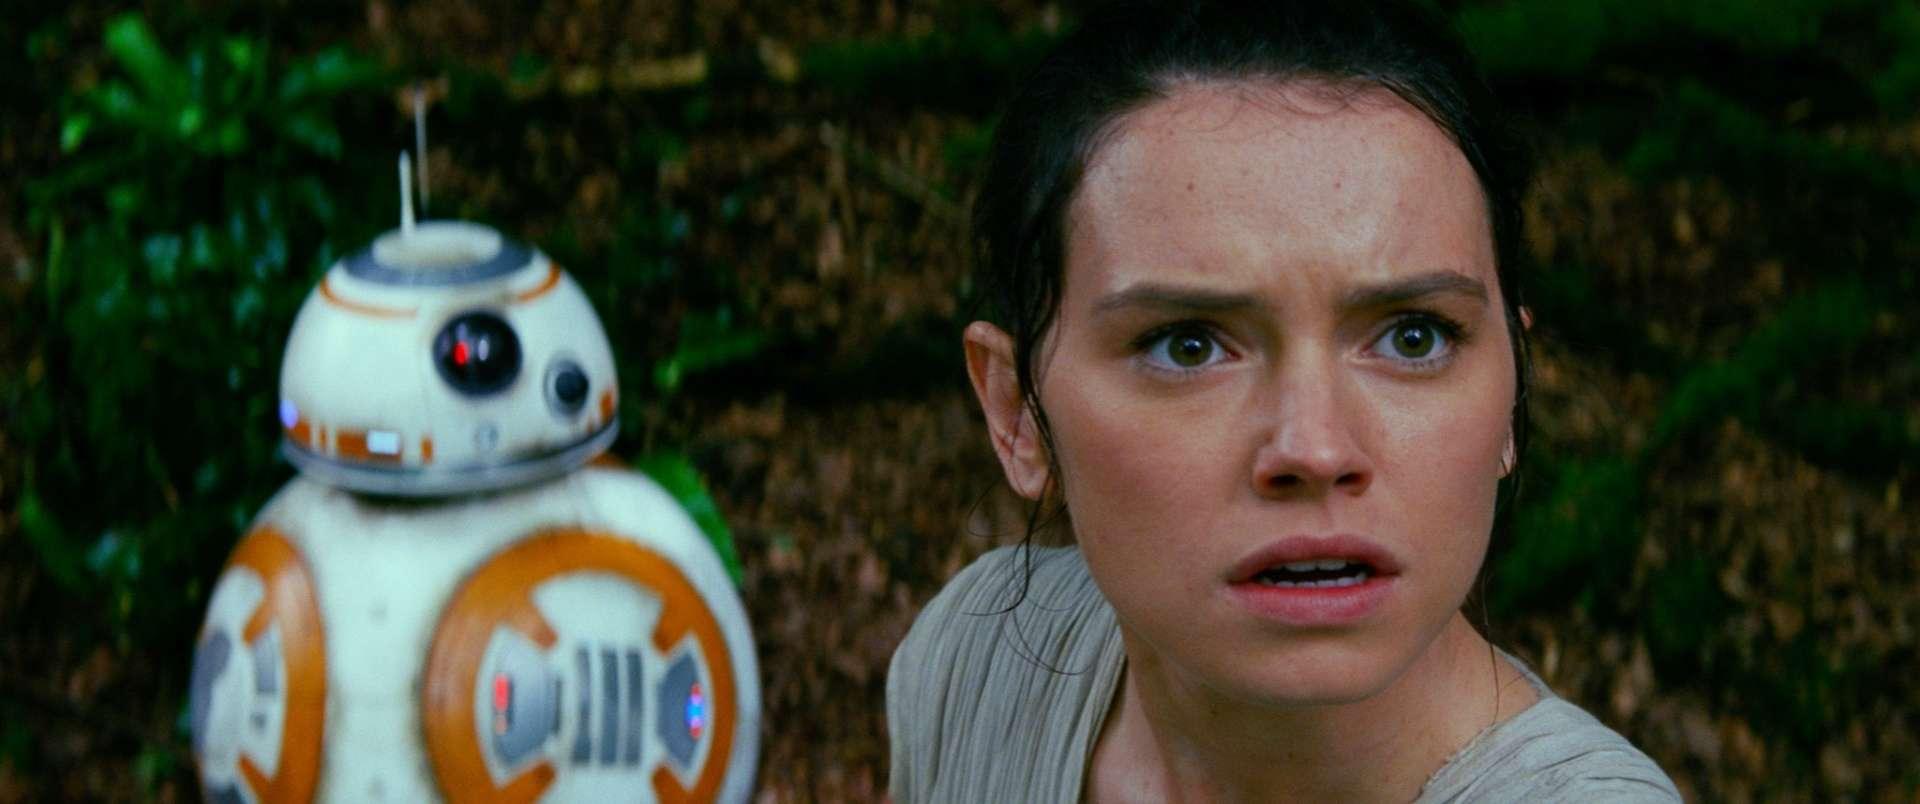 Star Wars Episode VII The Force Awakens Wallpaper 044